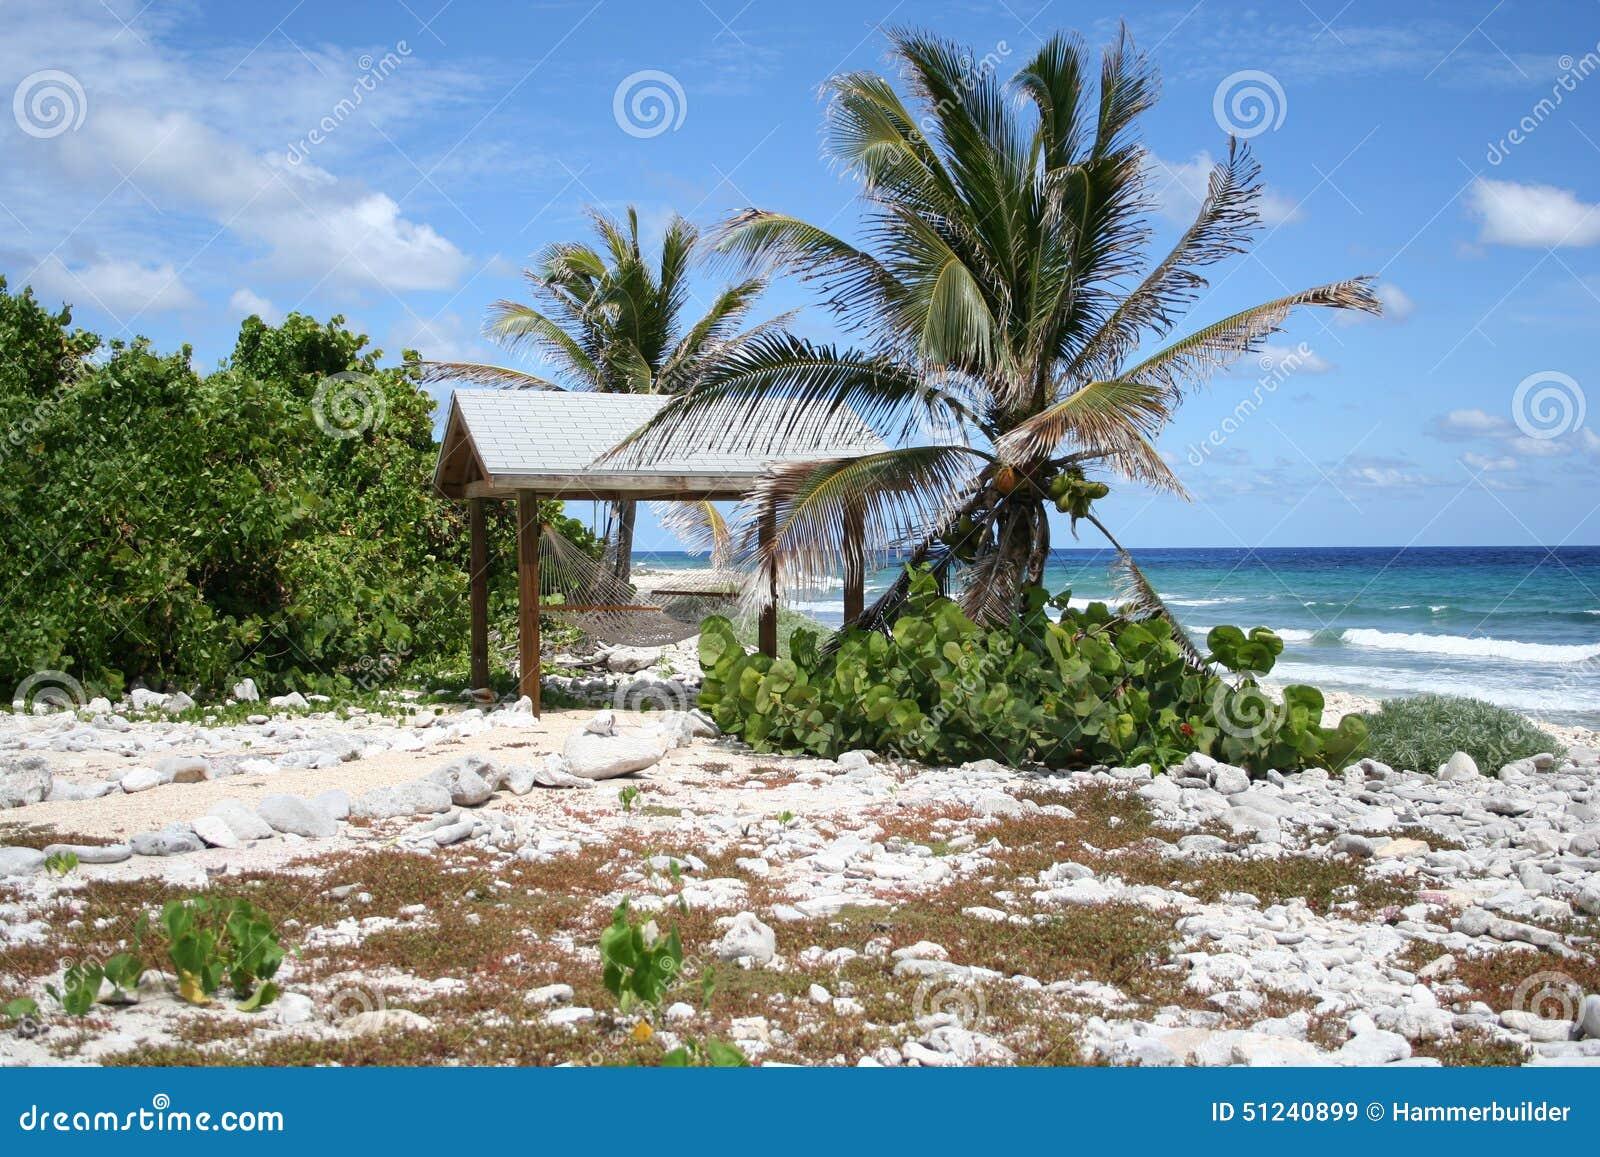 Tropical Island Beach Hut: Cayman Brac Island Hammock Tiki Hut Stock Photo